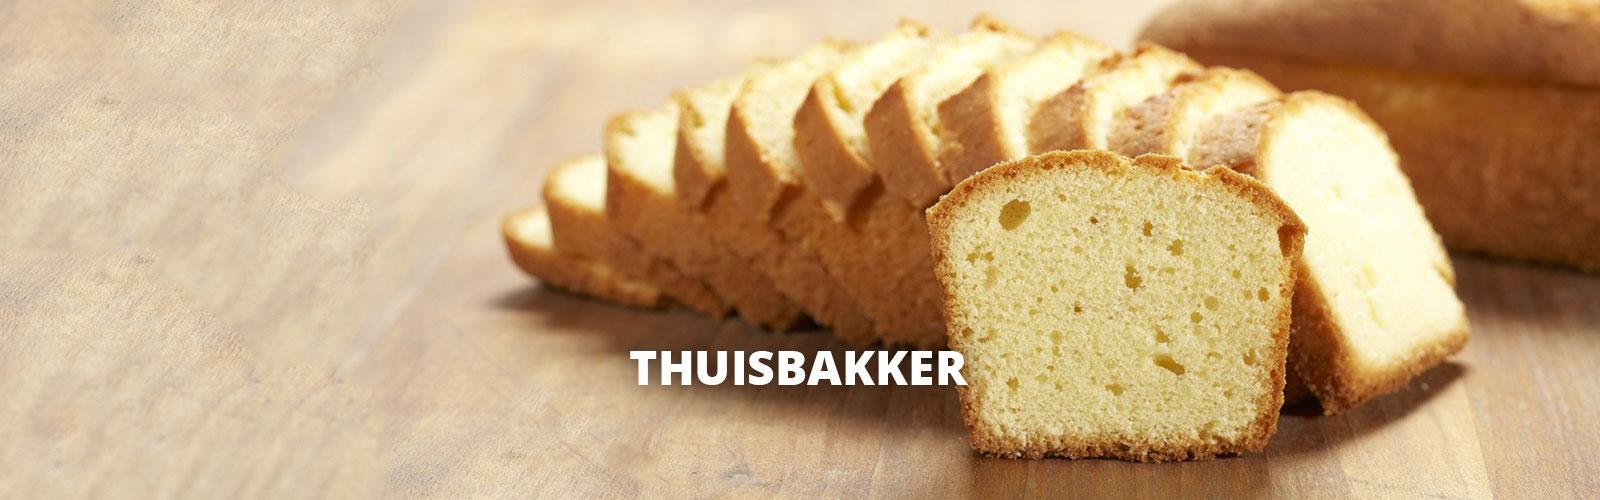 Producten-Thuisbakker-Header